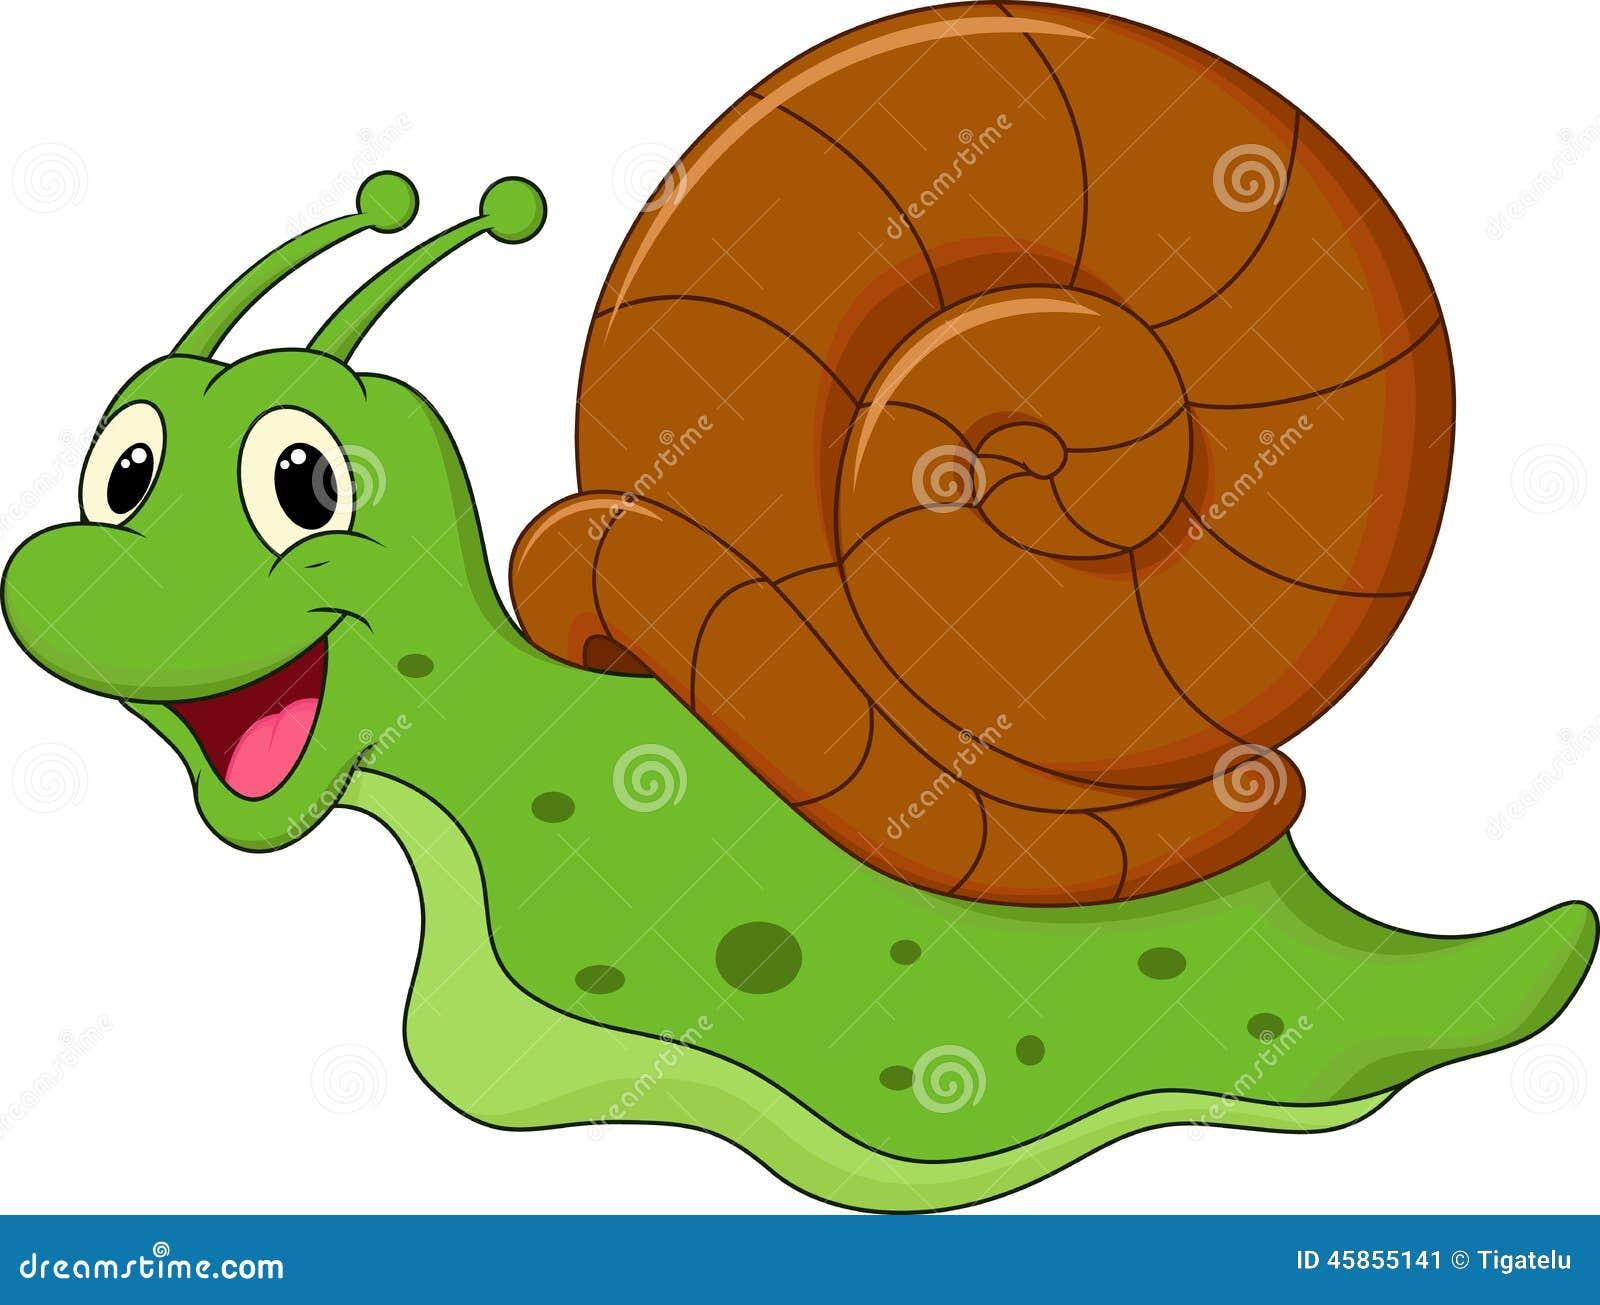 Cute cartoon snail stock vector. Illustration of creep ...